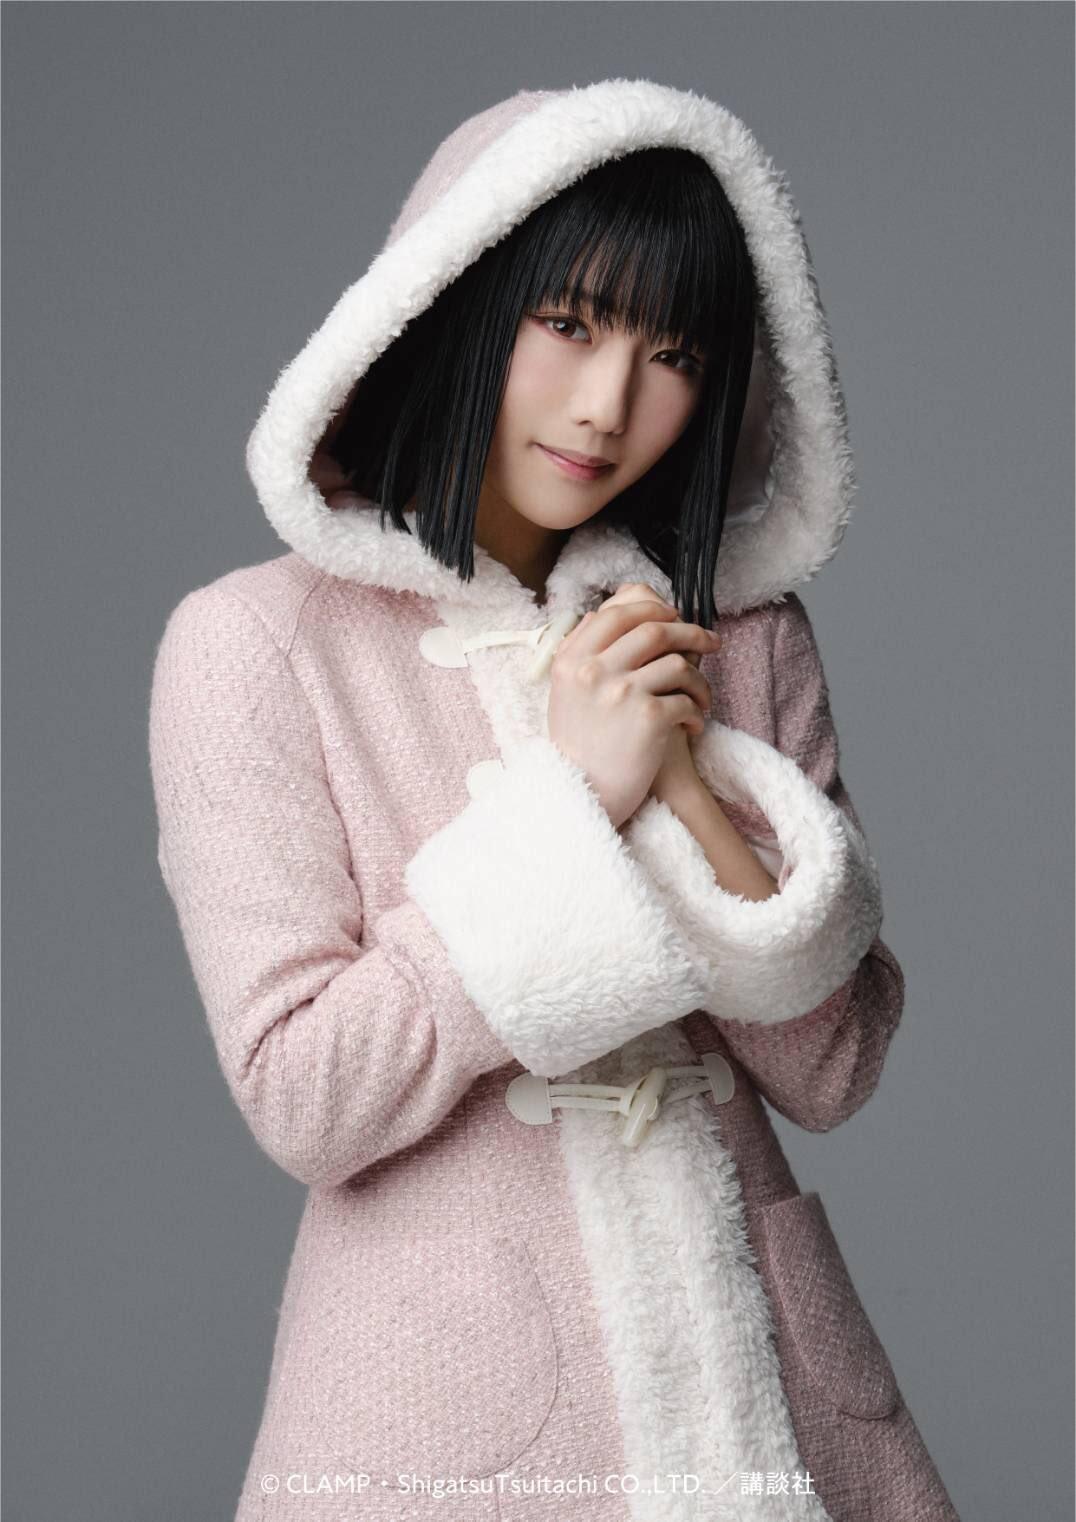 SakuraiKeitoO 1402557321809600514_p1